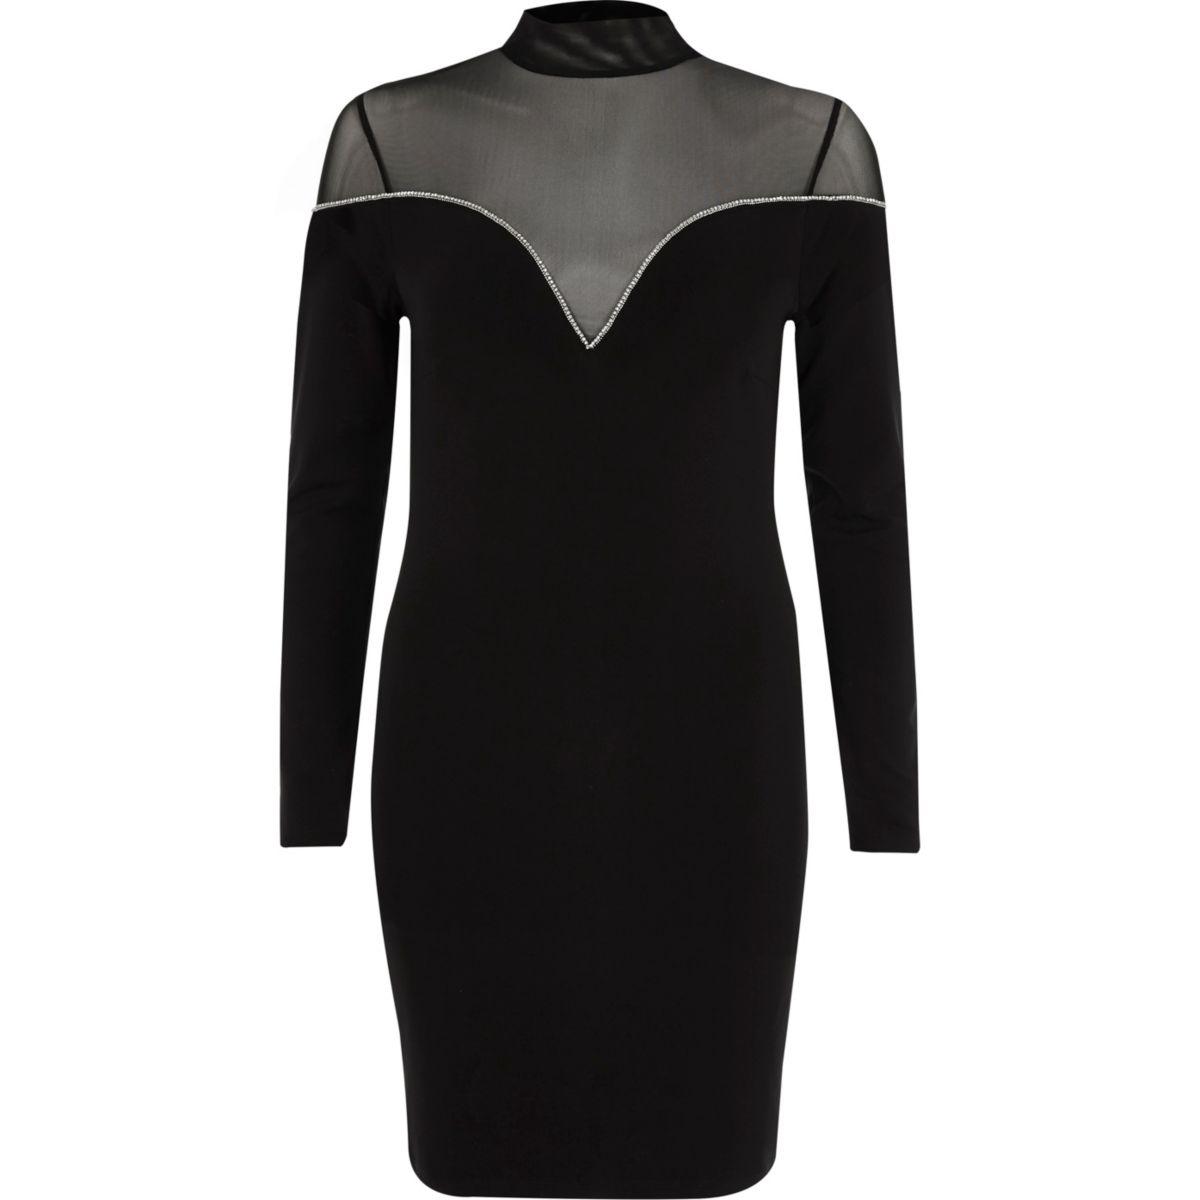 Black mesh insert diamante trim mini dress